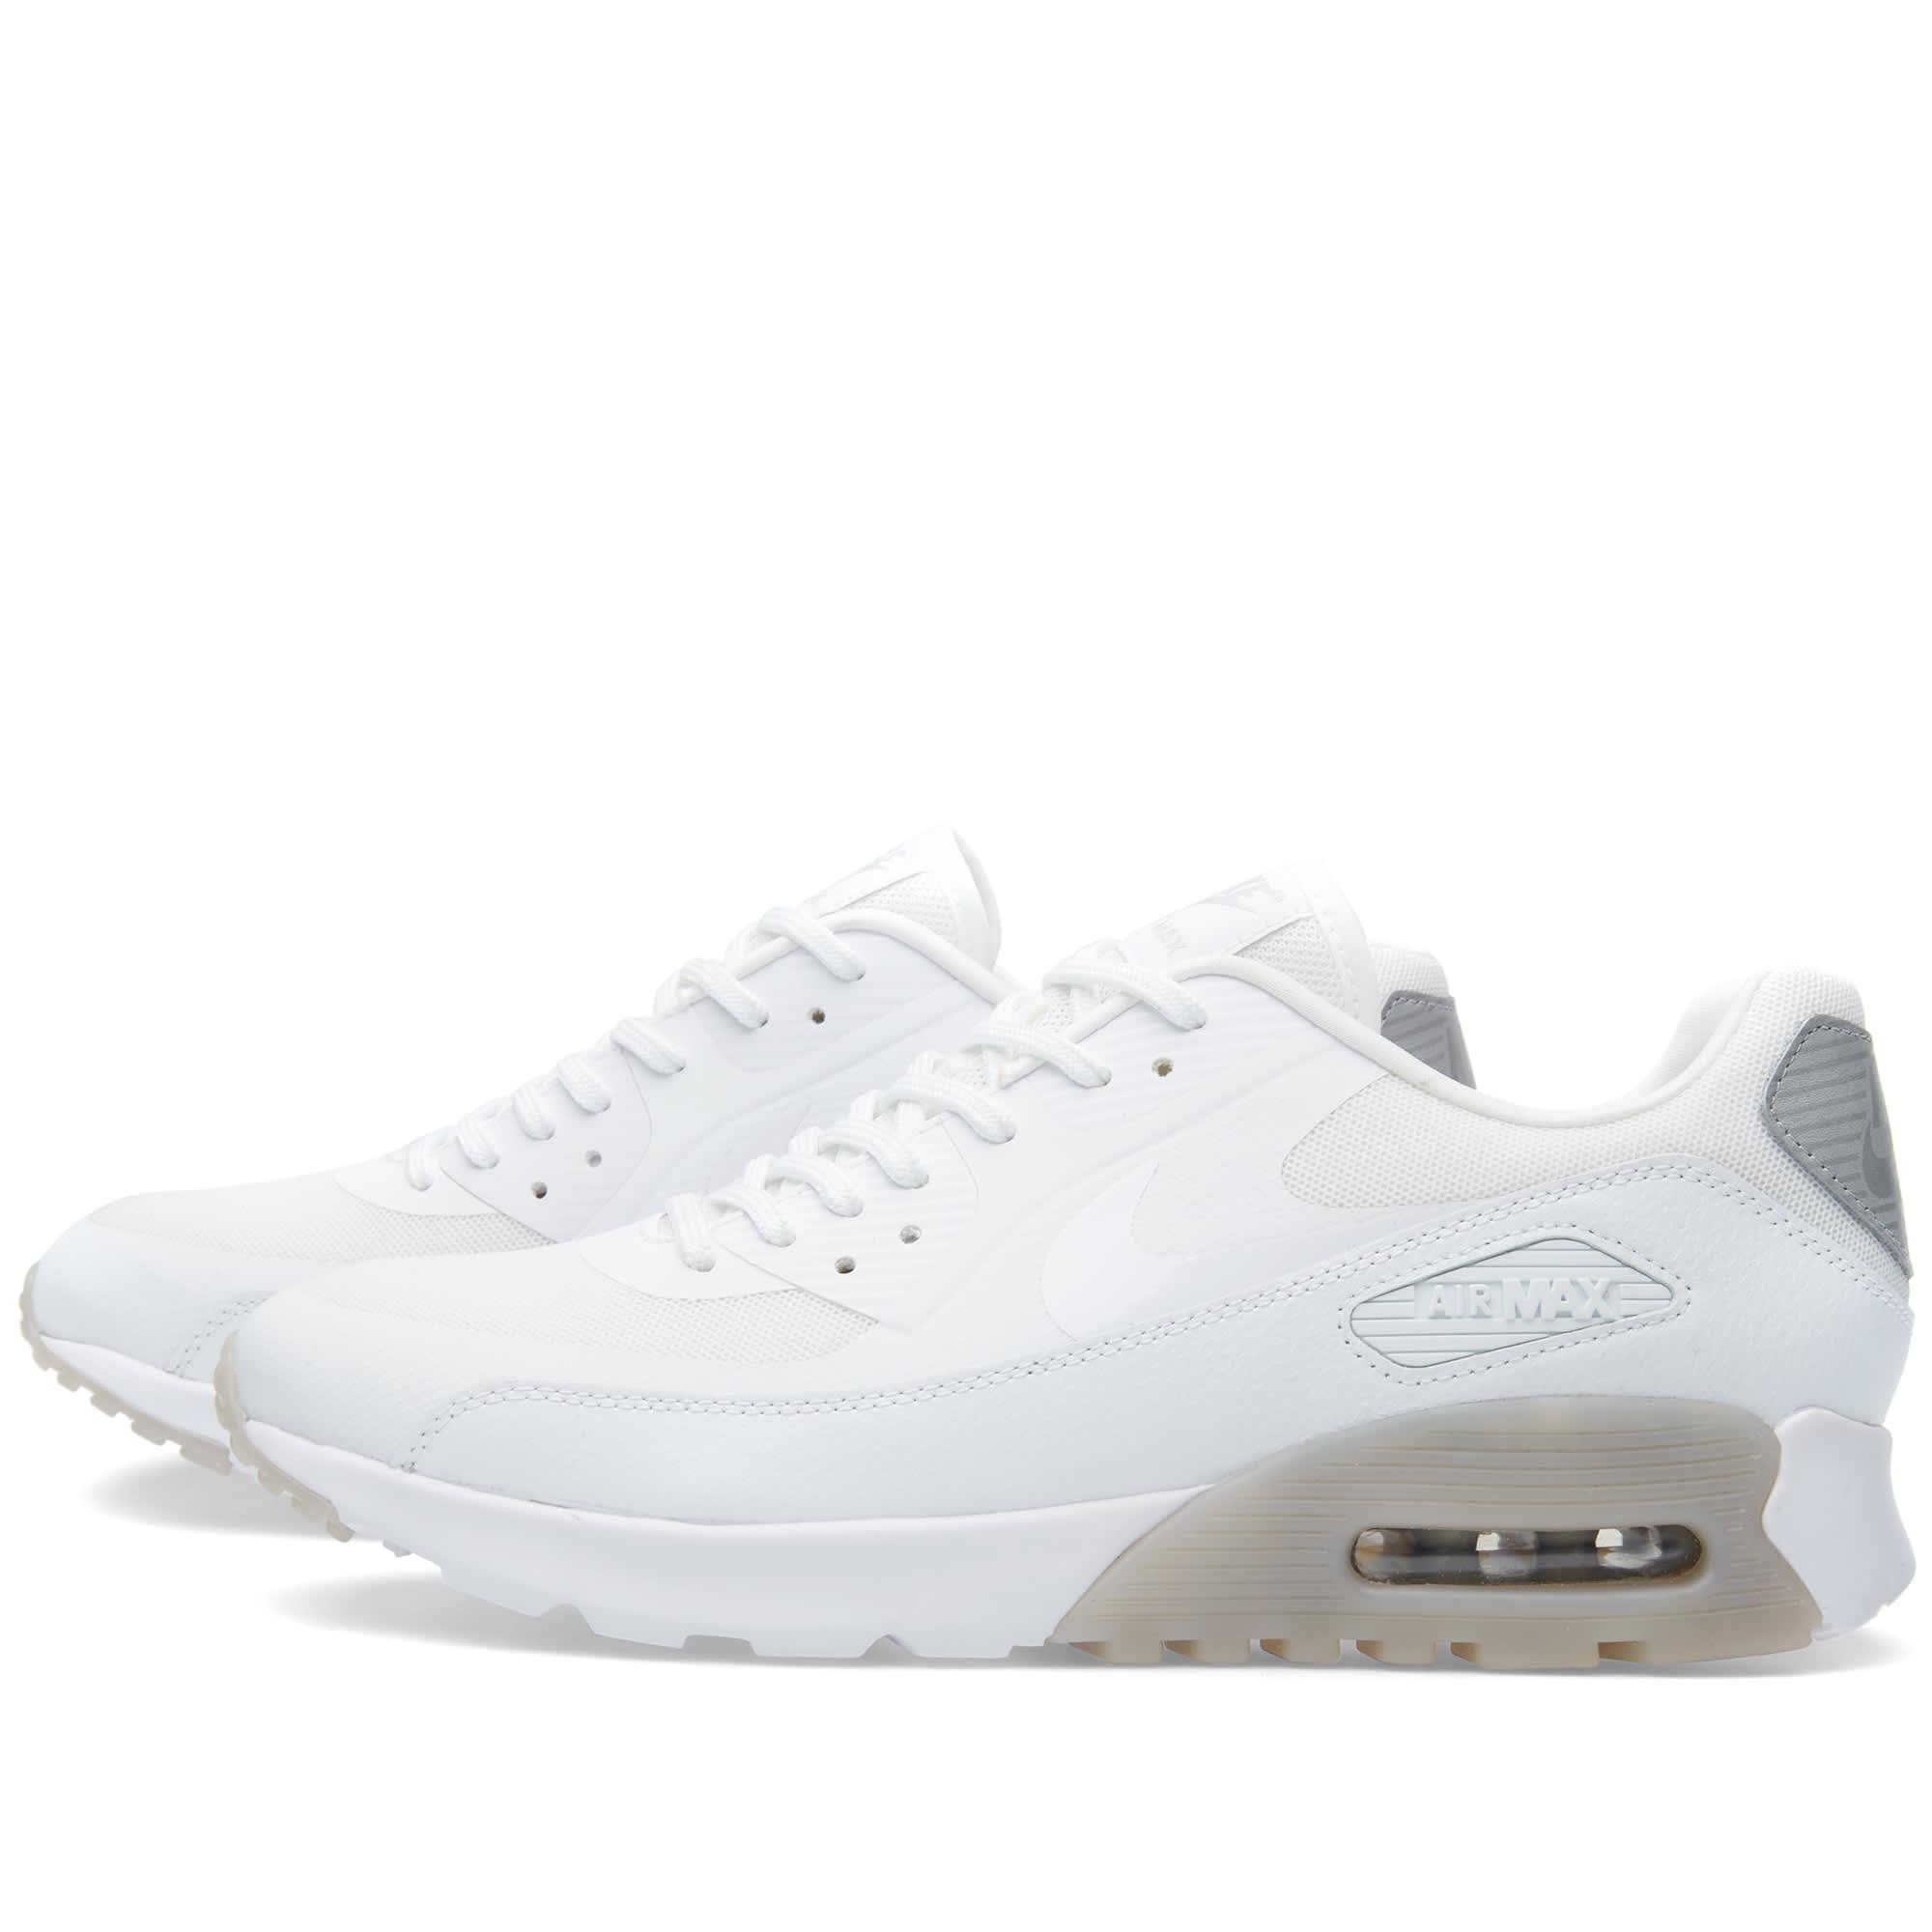 0093bbf99e Nike W Air Max 90 Ultra Essential White & Wolf Grey | END.